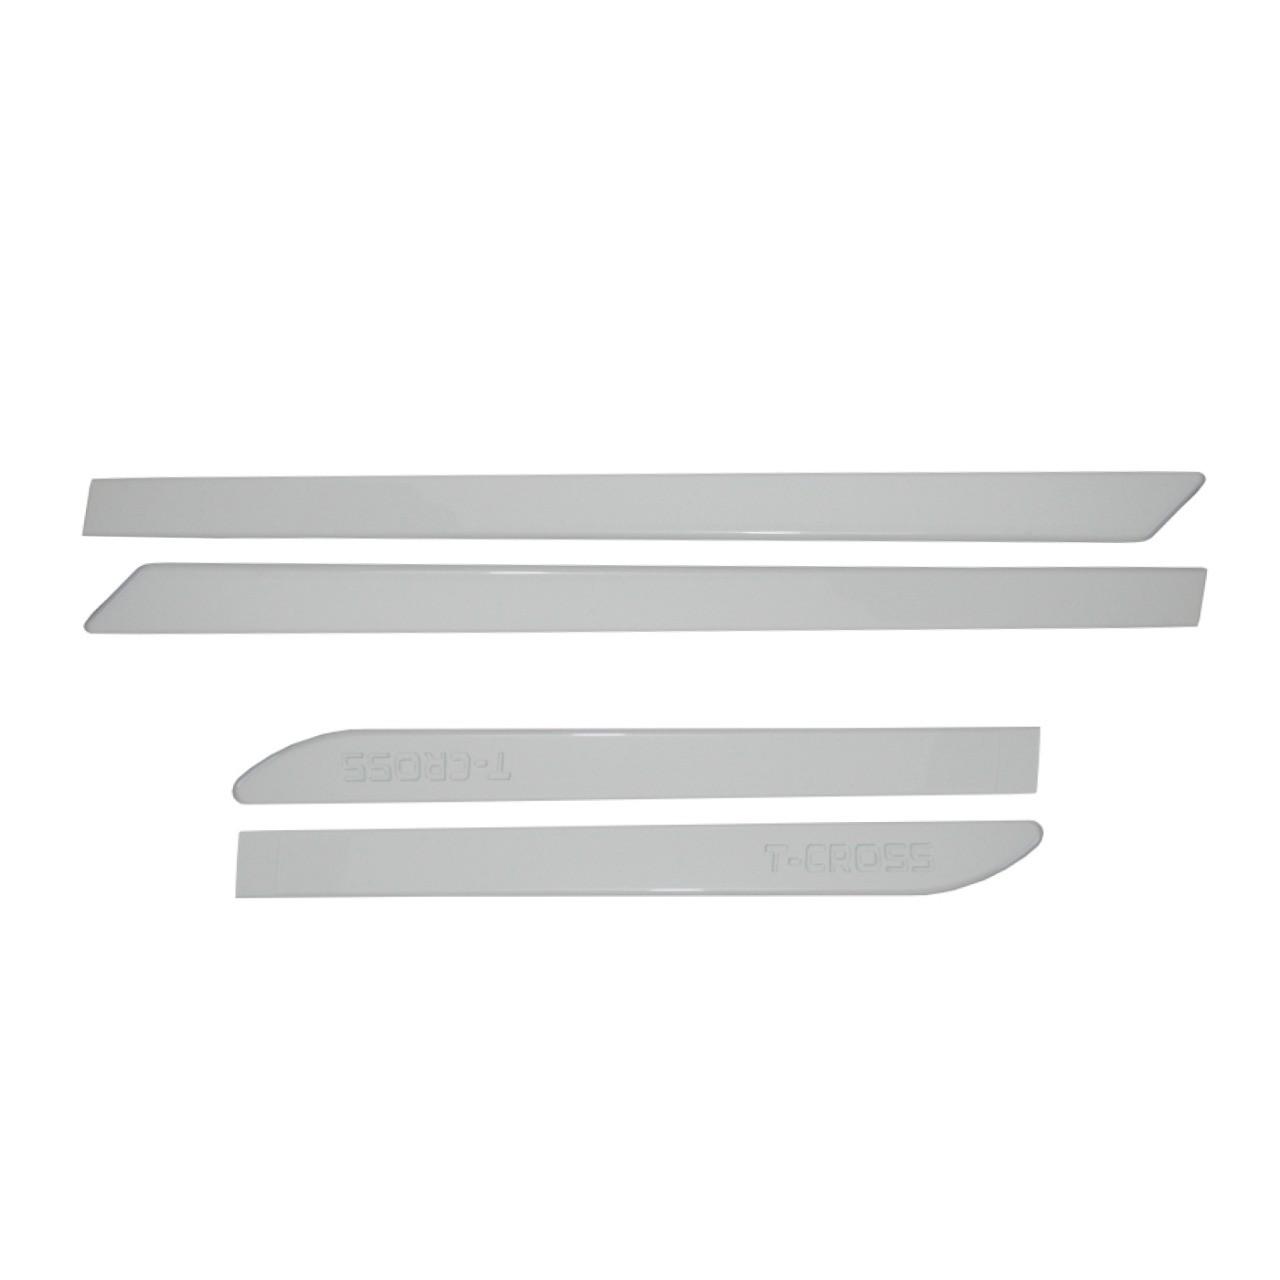 Friso Lateral T-Cross Branco Puro com nome em baixo relevo